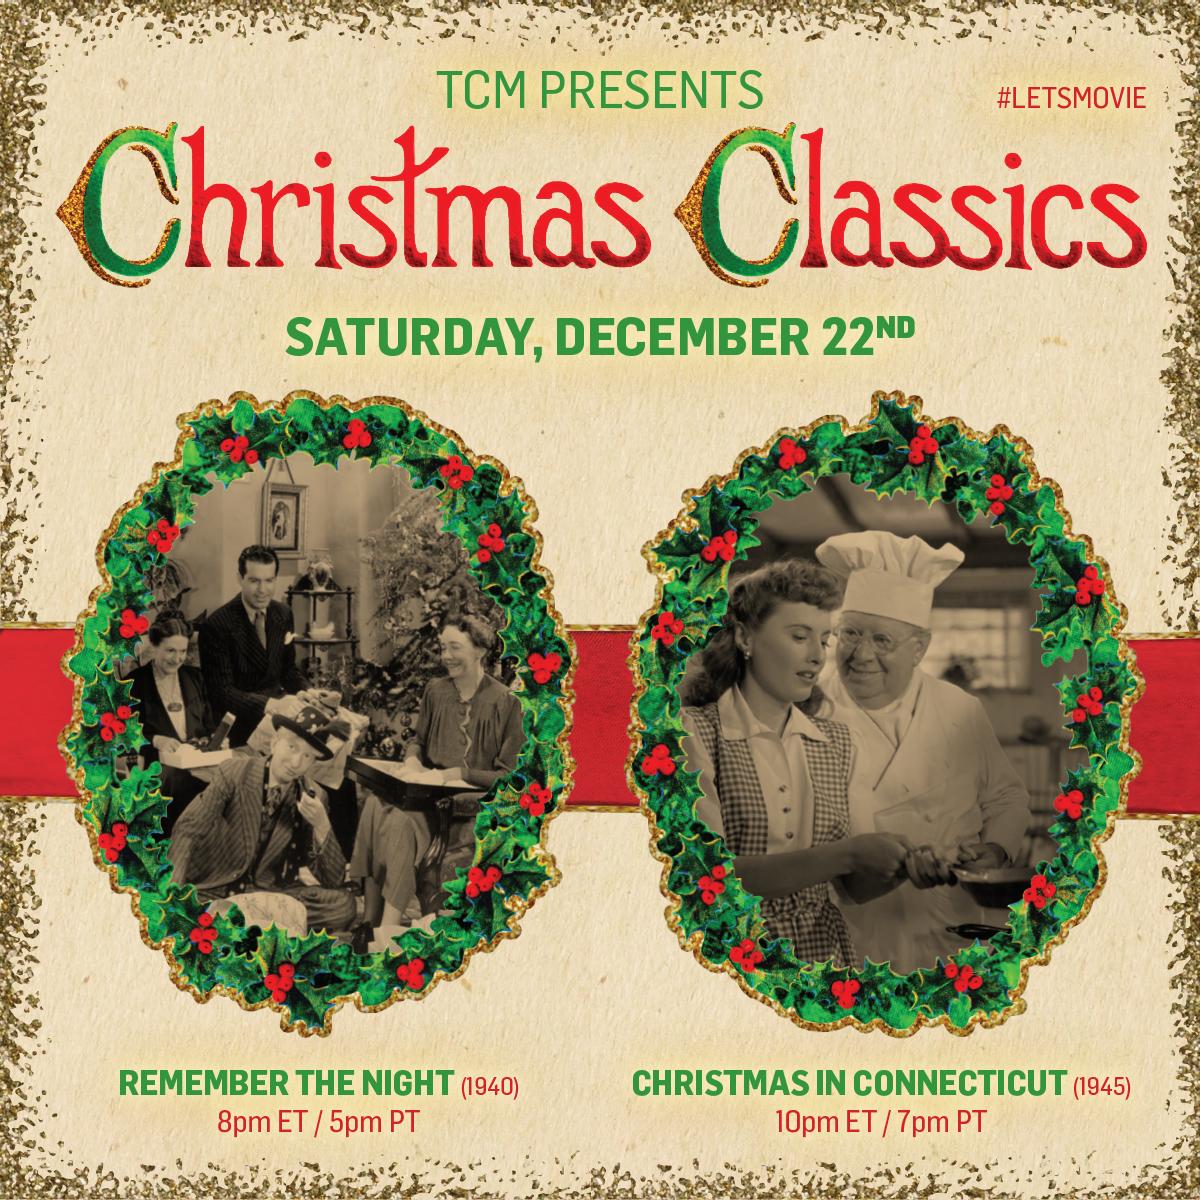 TCM_SocialAssets_18-11_ChristmasClassicsAssets_1200x1200_FNL-Series-7.jpg